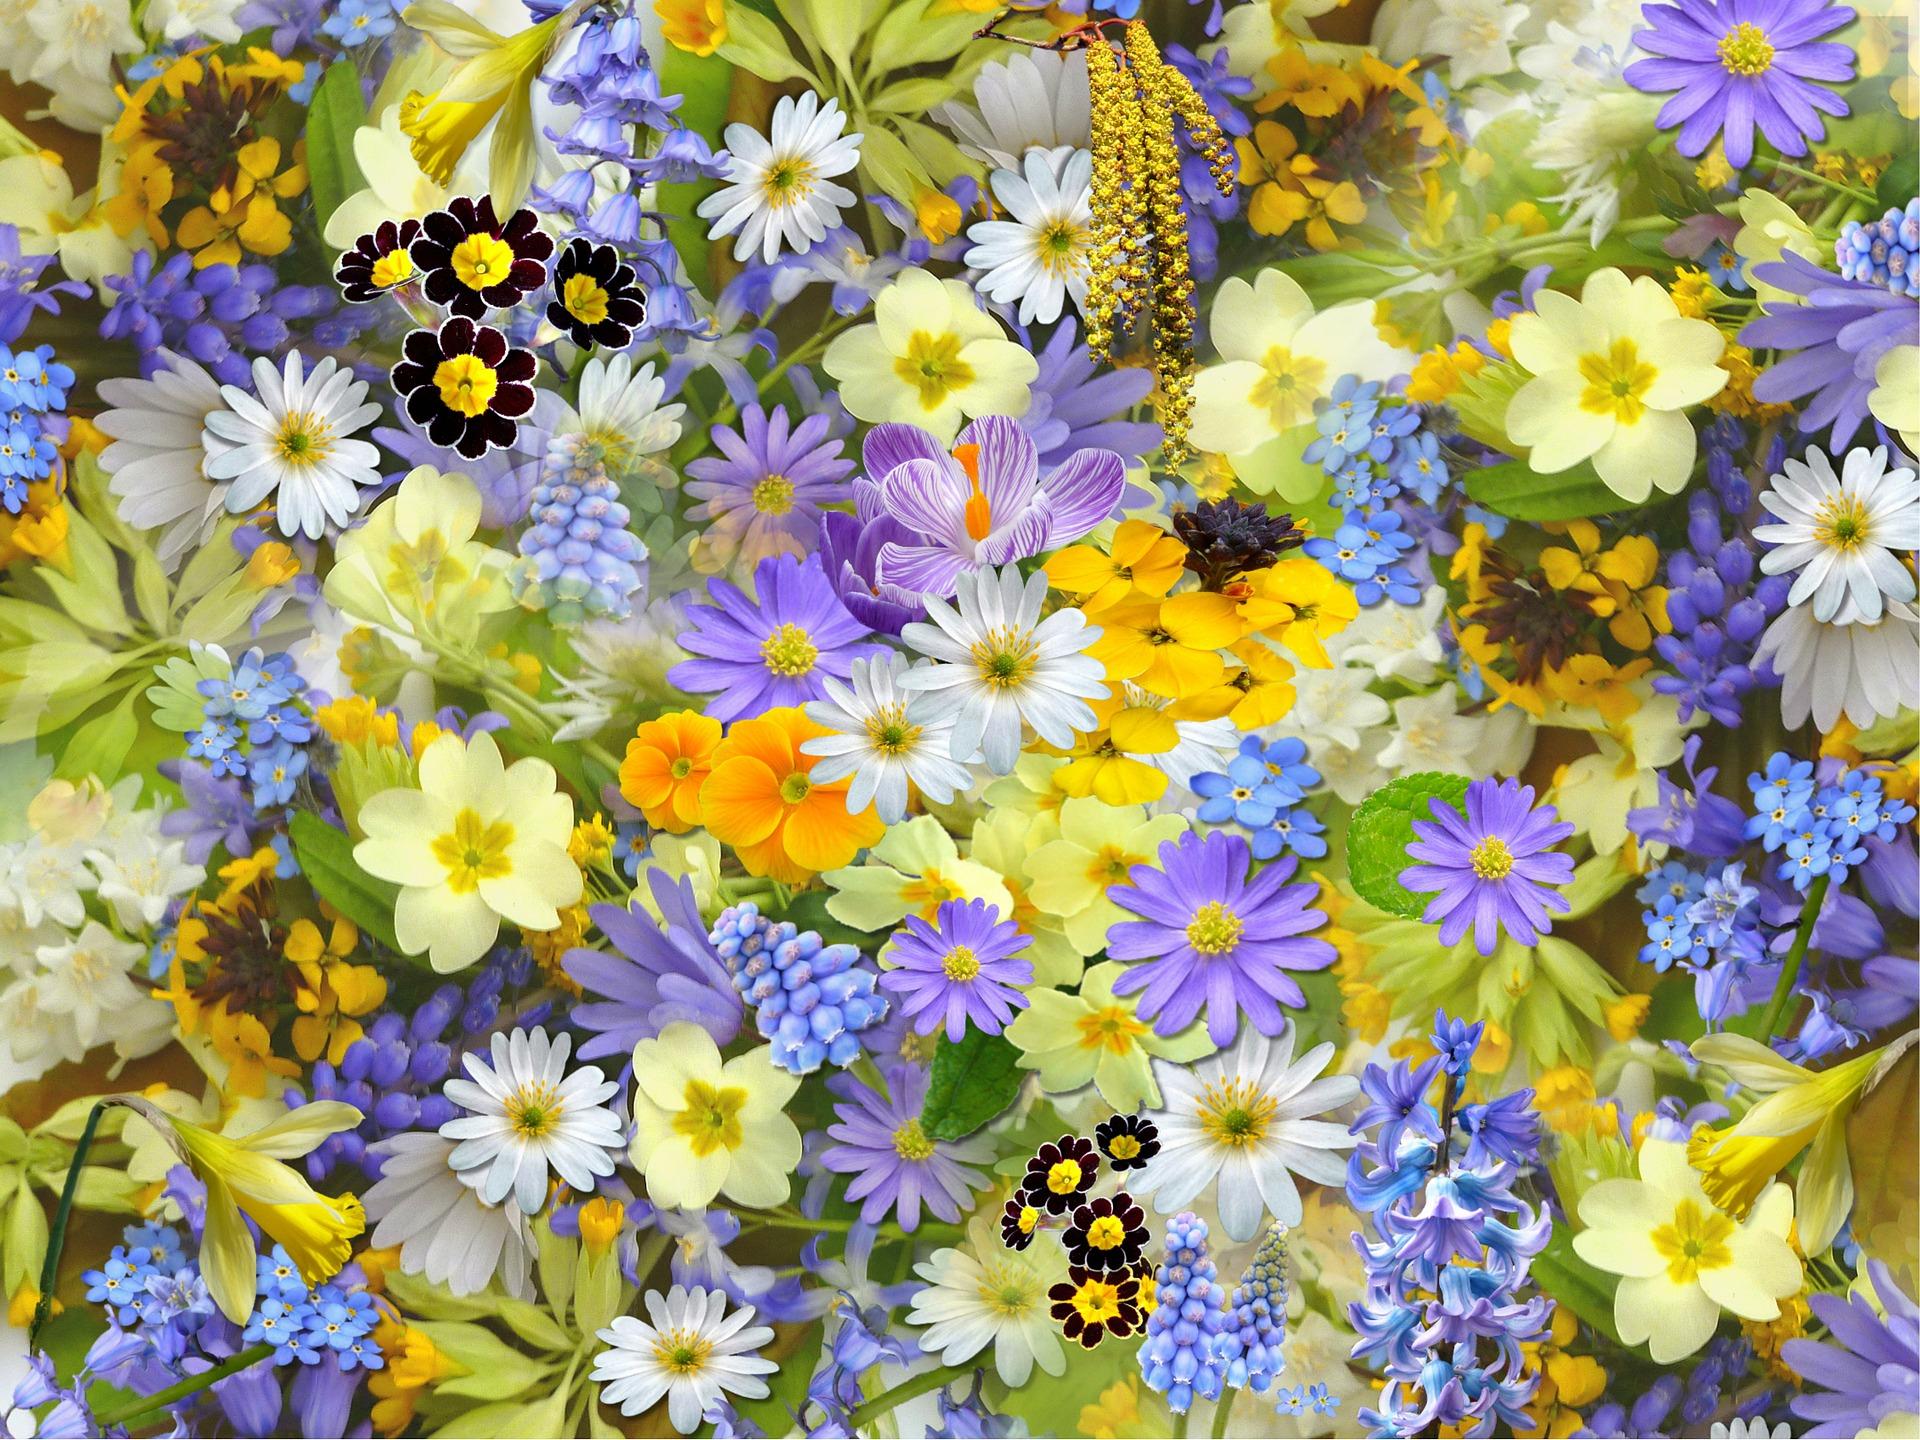 Chiropractor Orem flowers